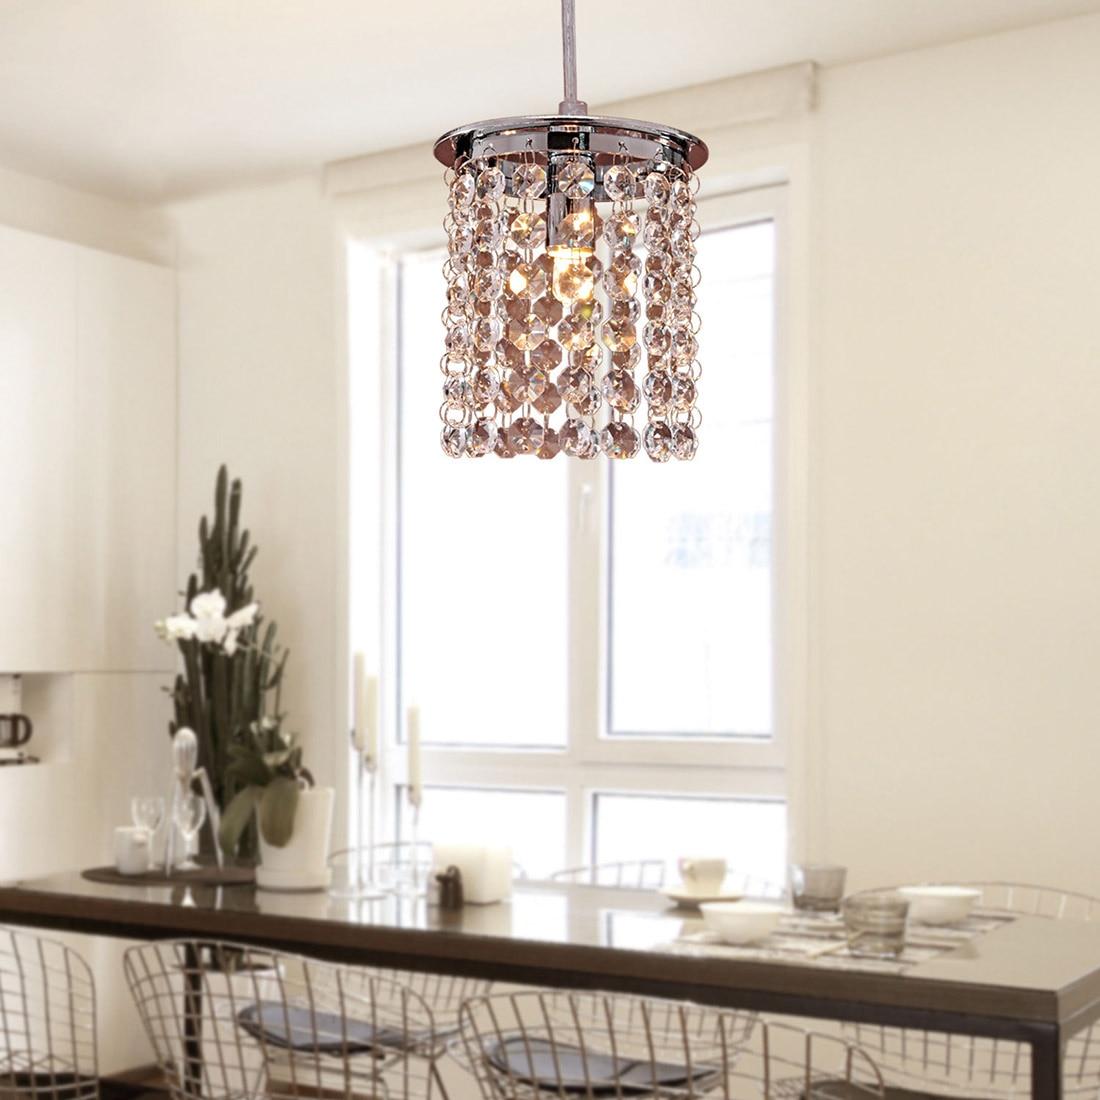 Kitchen Chandeliers: Crystal Light Modern Chandelier Pendant Kitchen Dining